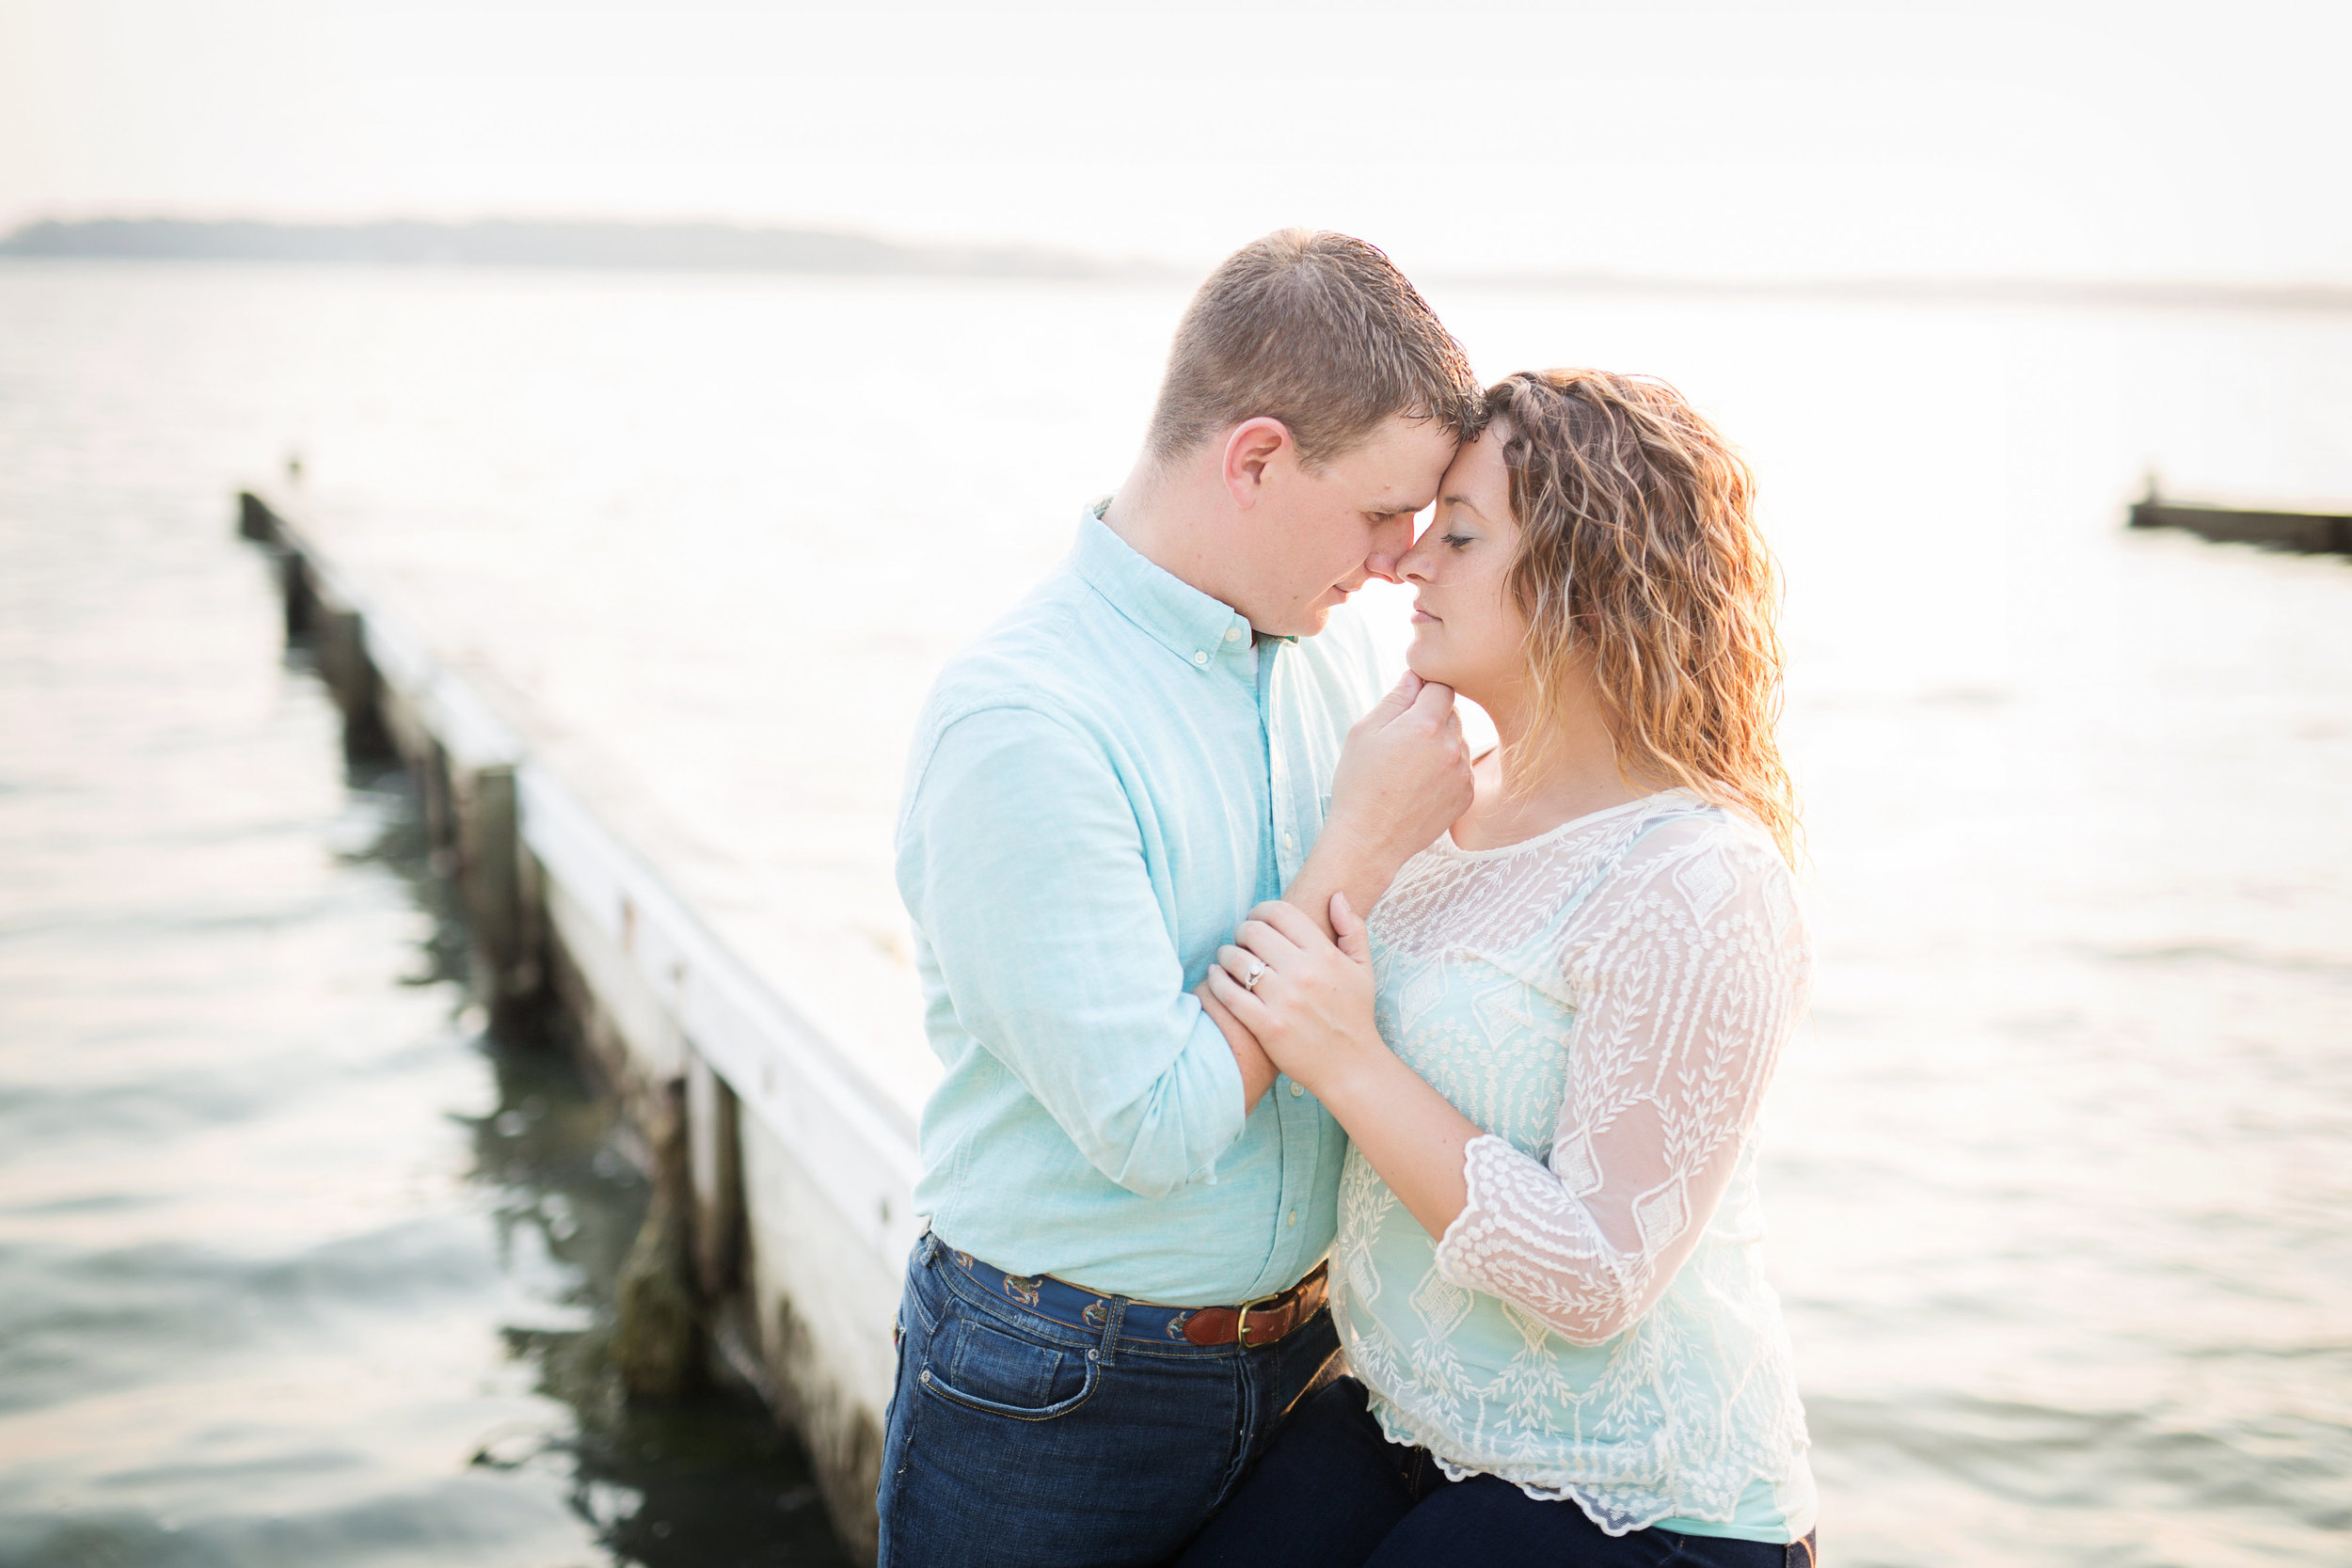 Joey Elyse Engaged-Joey Thompson-0046.jpg